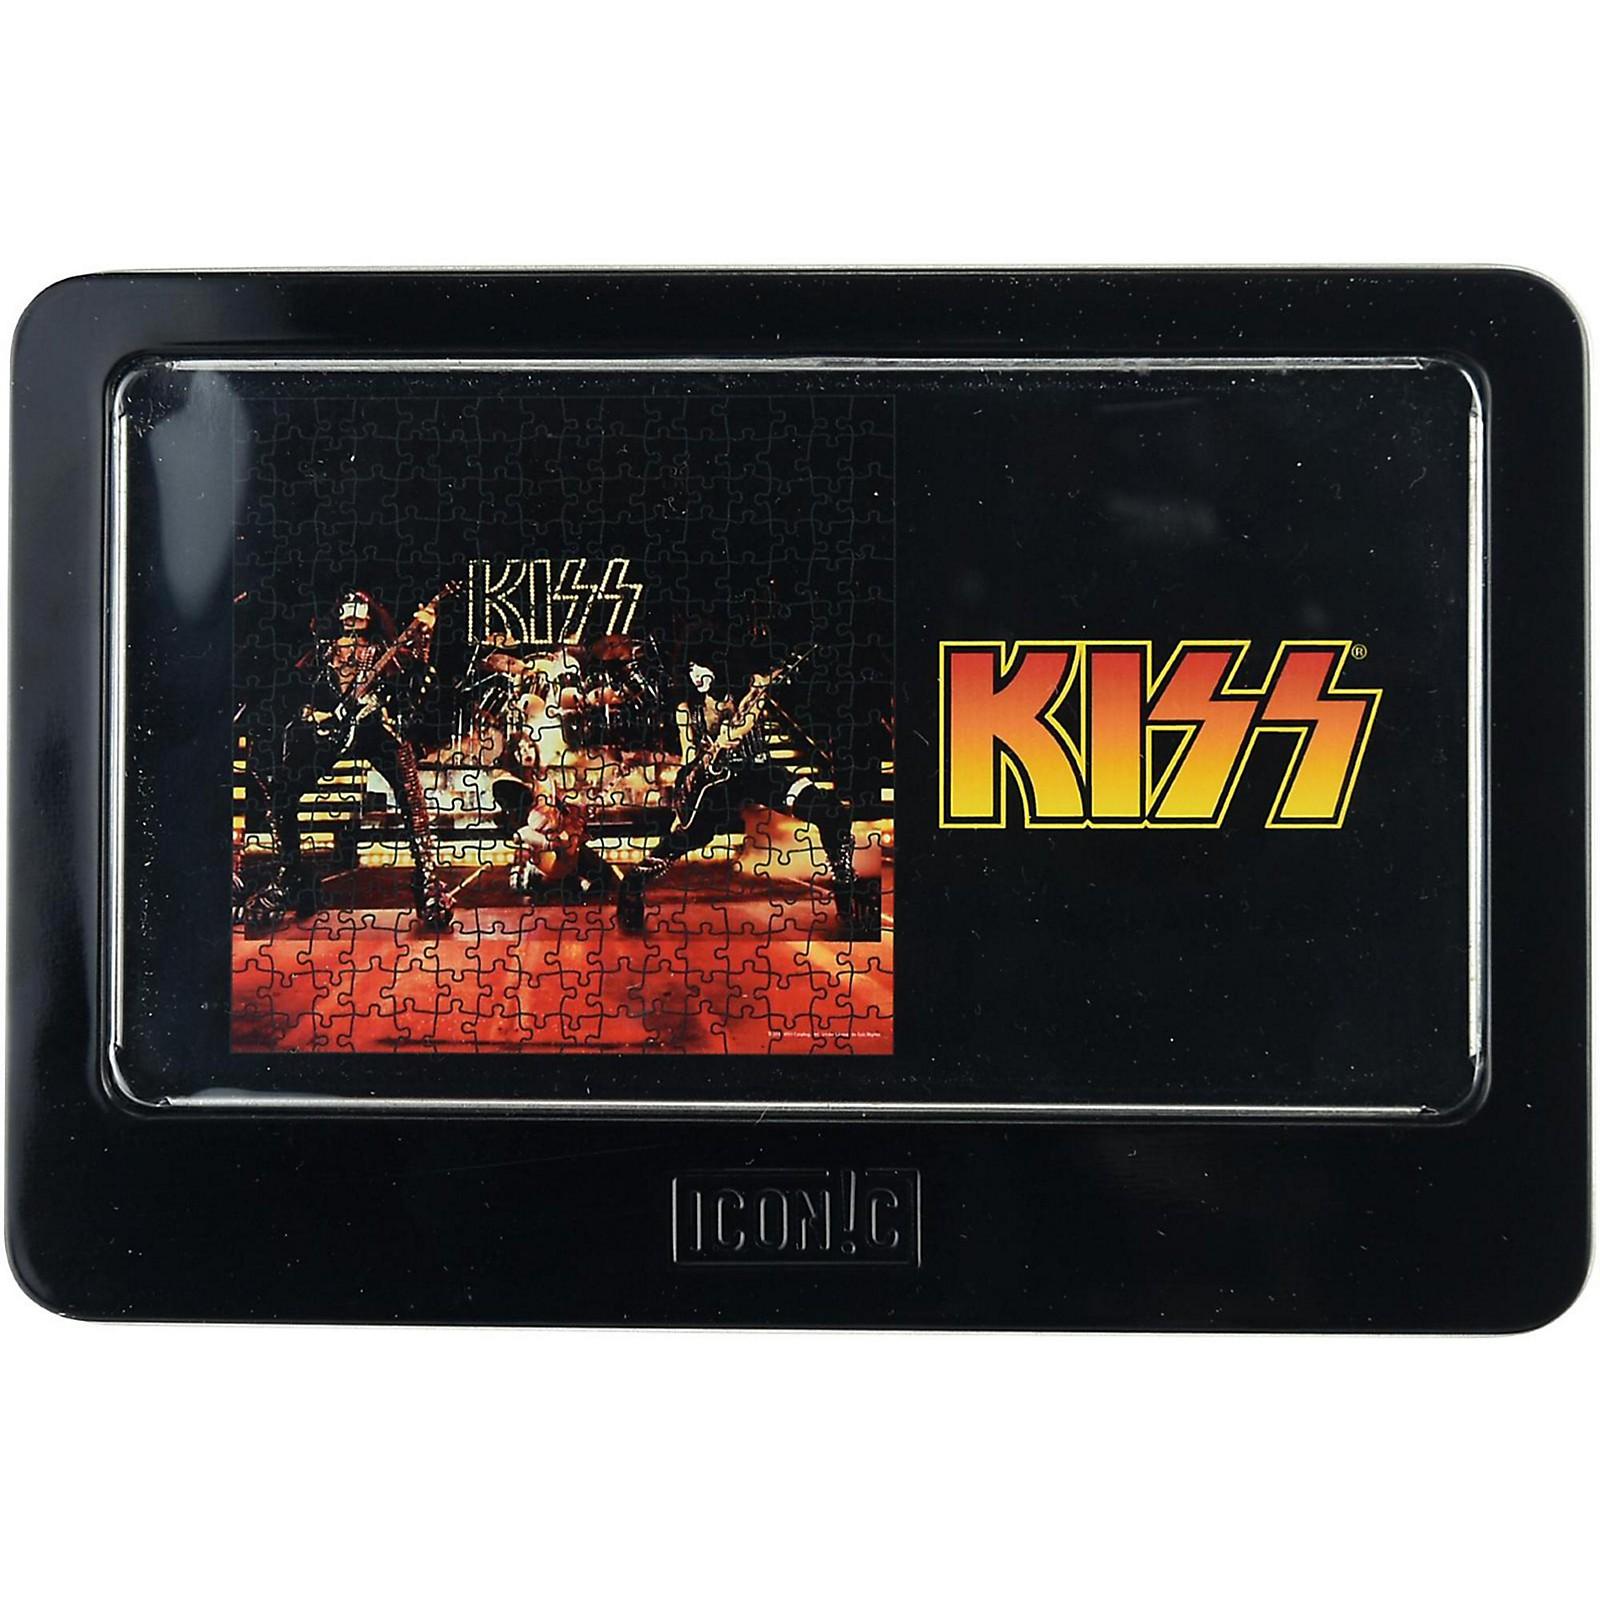 Iconic Concepts KISS 1977 Live Performance 3D Lenticular Puzzle